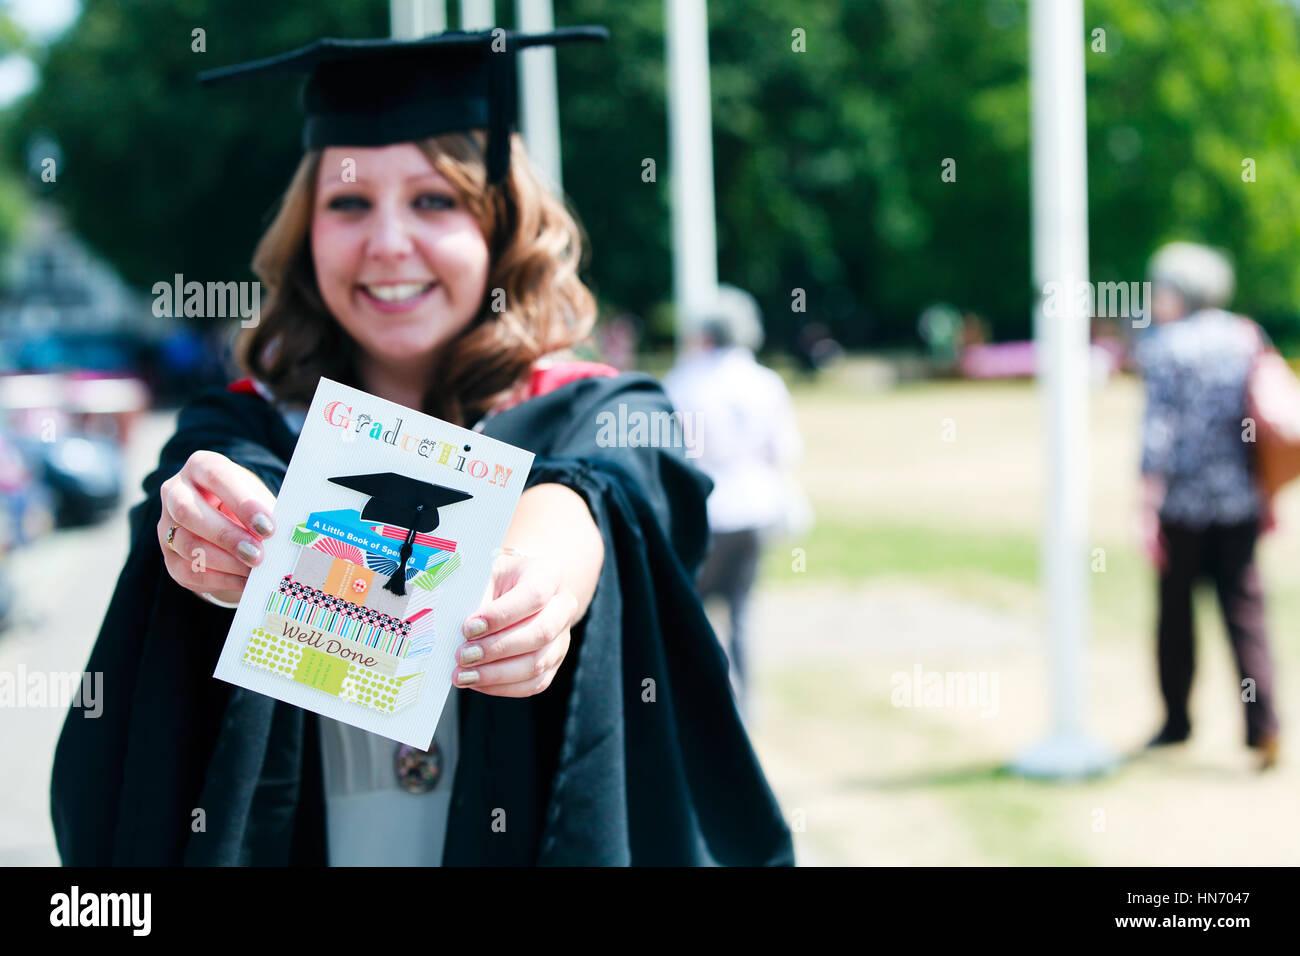 Female Uk University Graduate Mortarboard Gown Stock Photos & Female ...